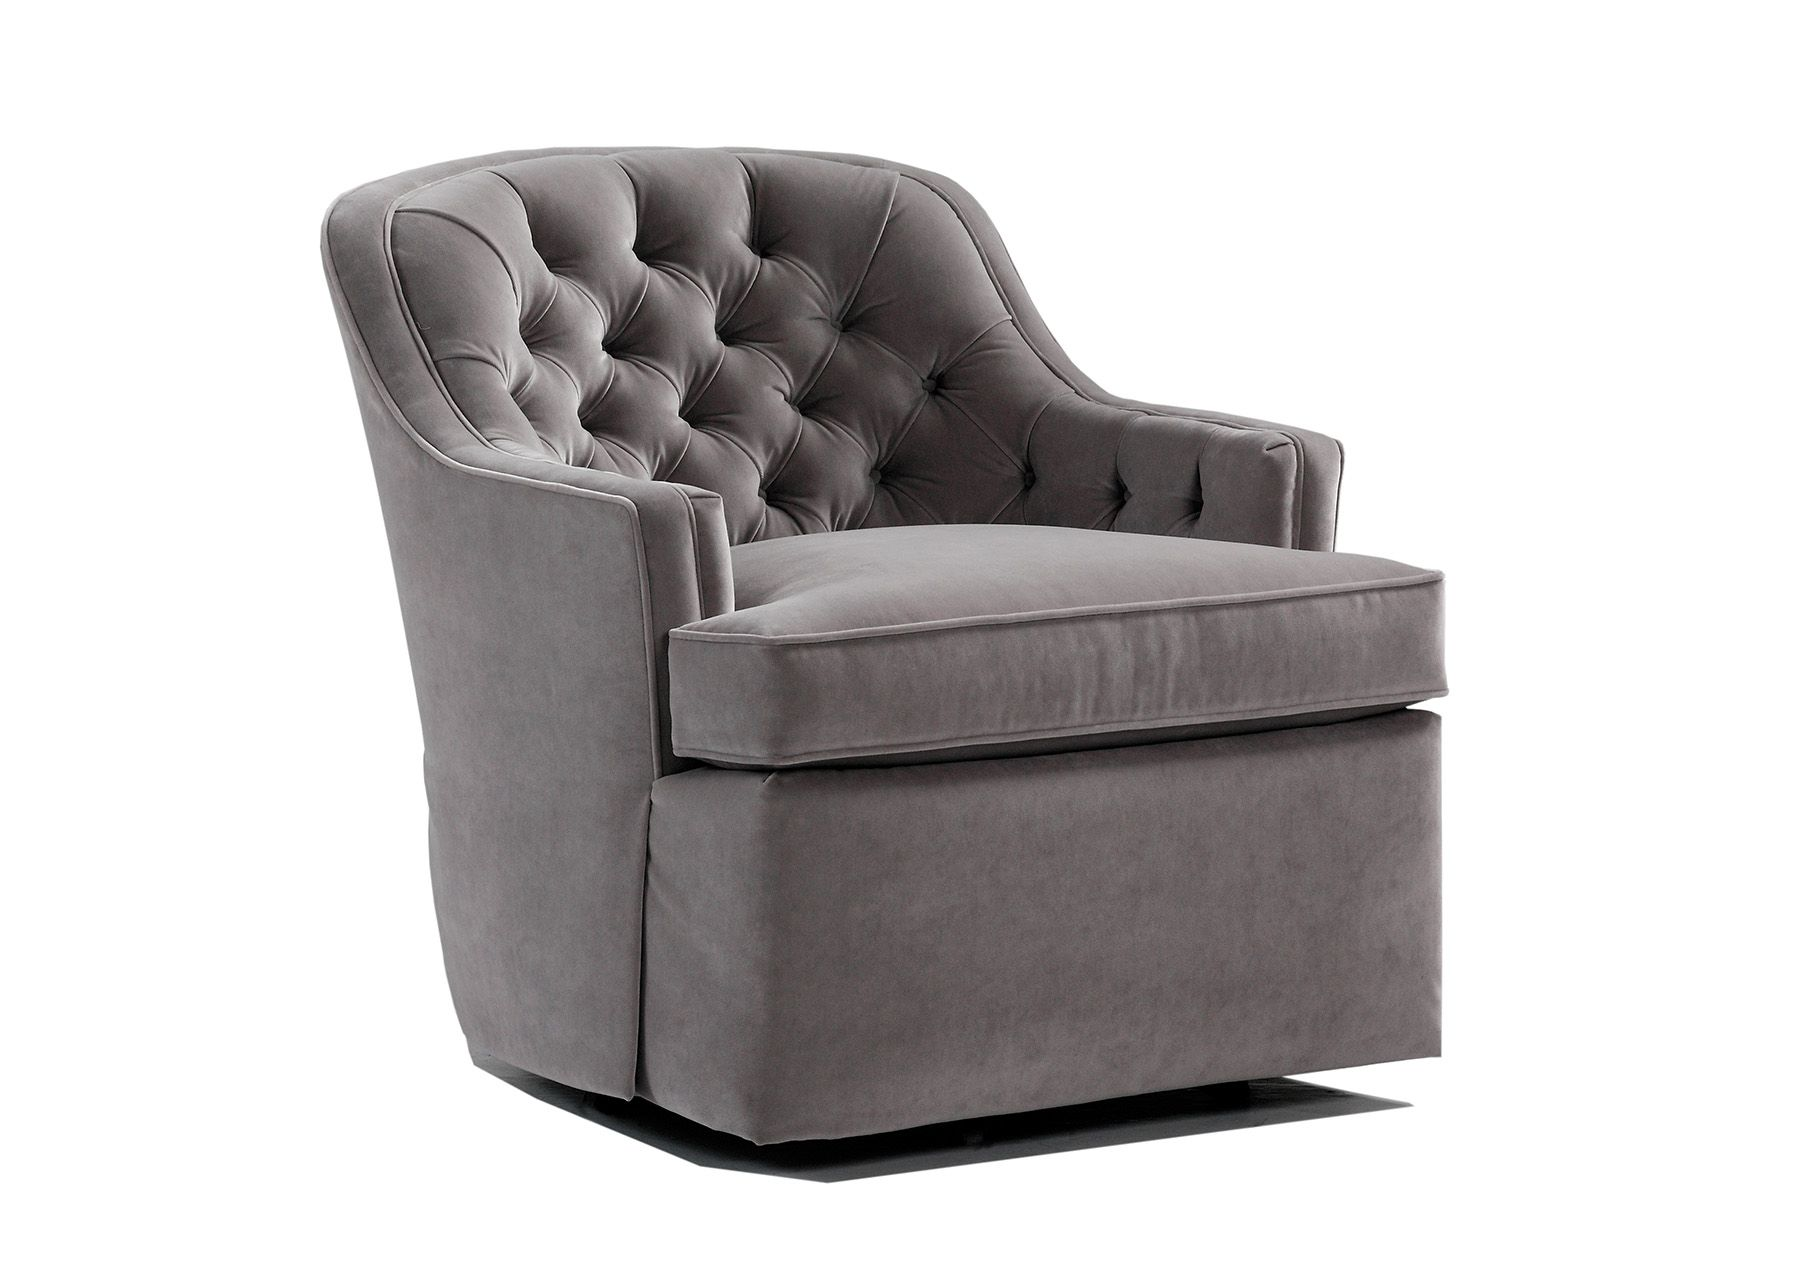 Darcy swivel rocker furniture swivel chair living room